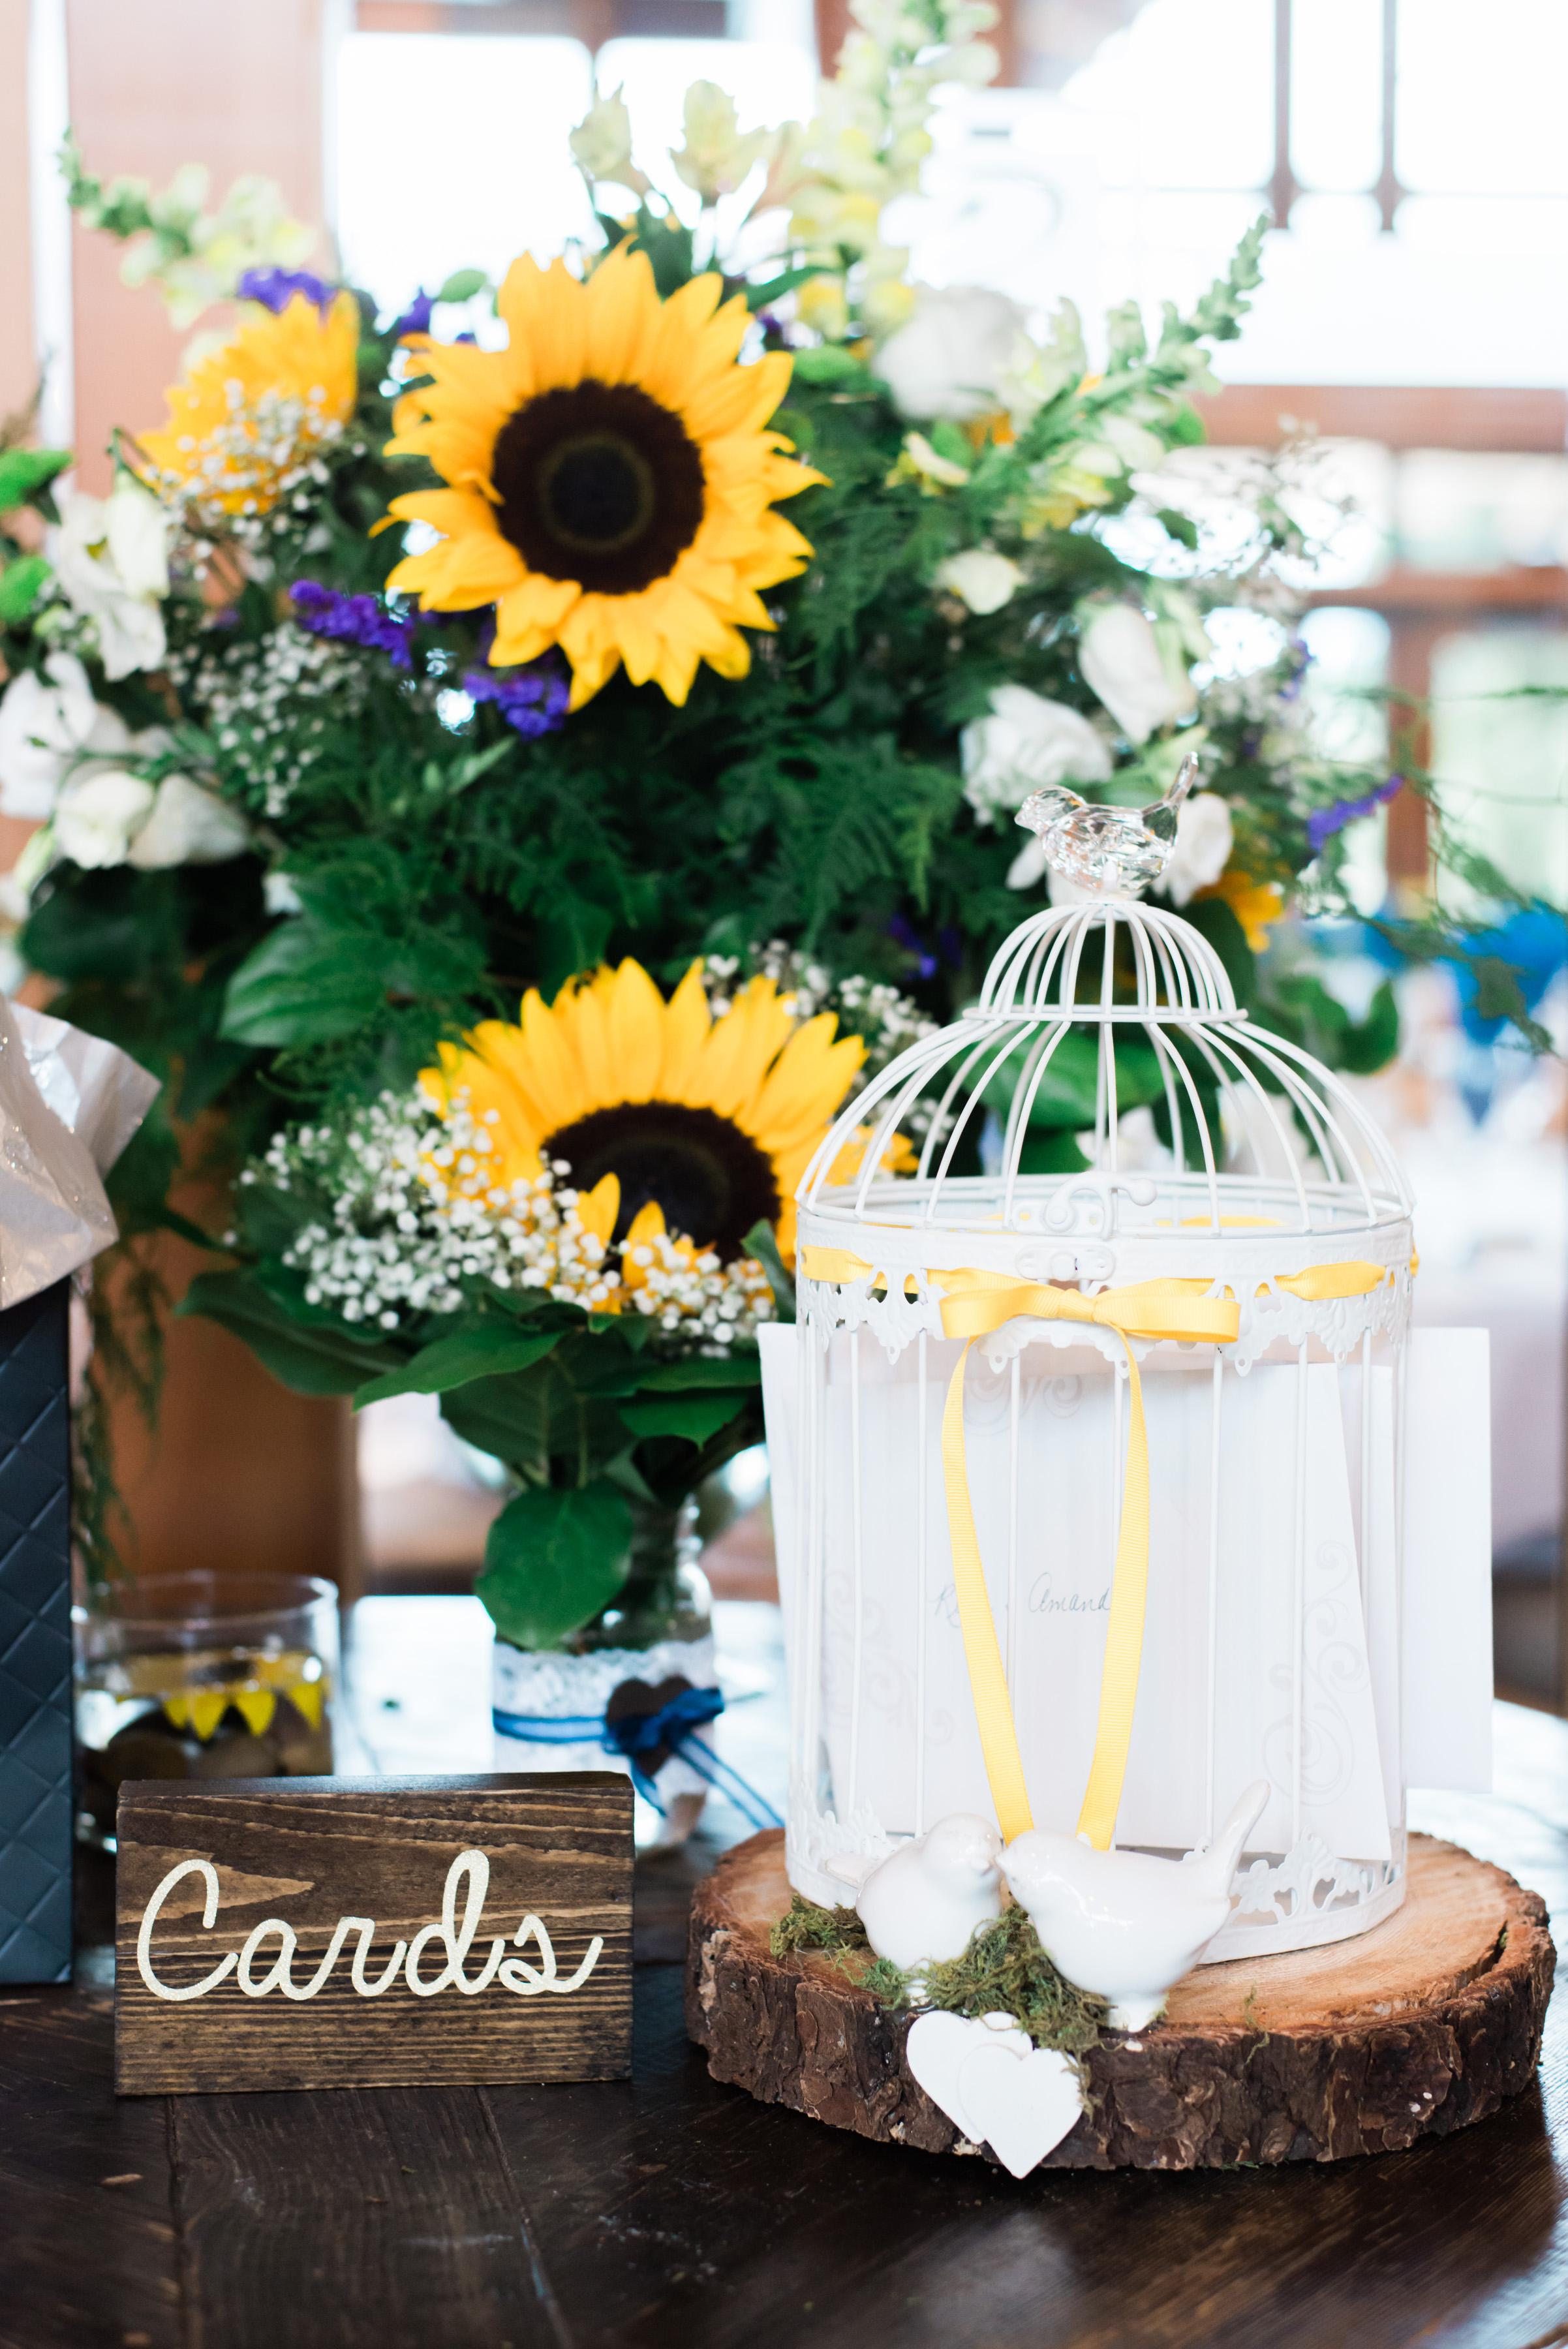 Amanda-rene-wedding-0561-jelger-tanja-photographers.jpg